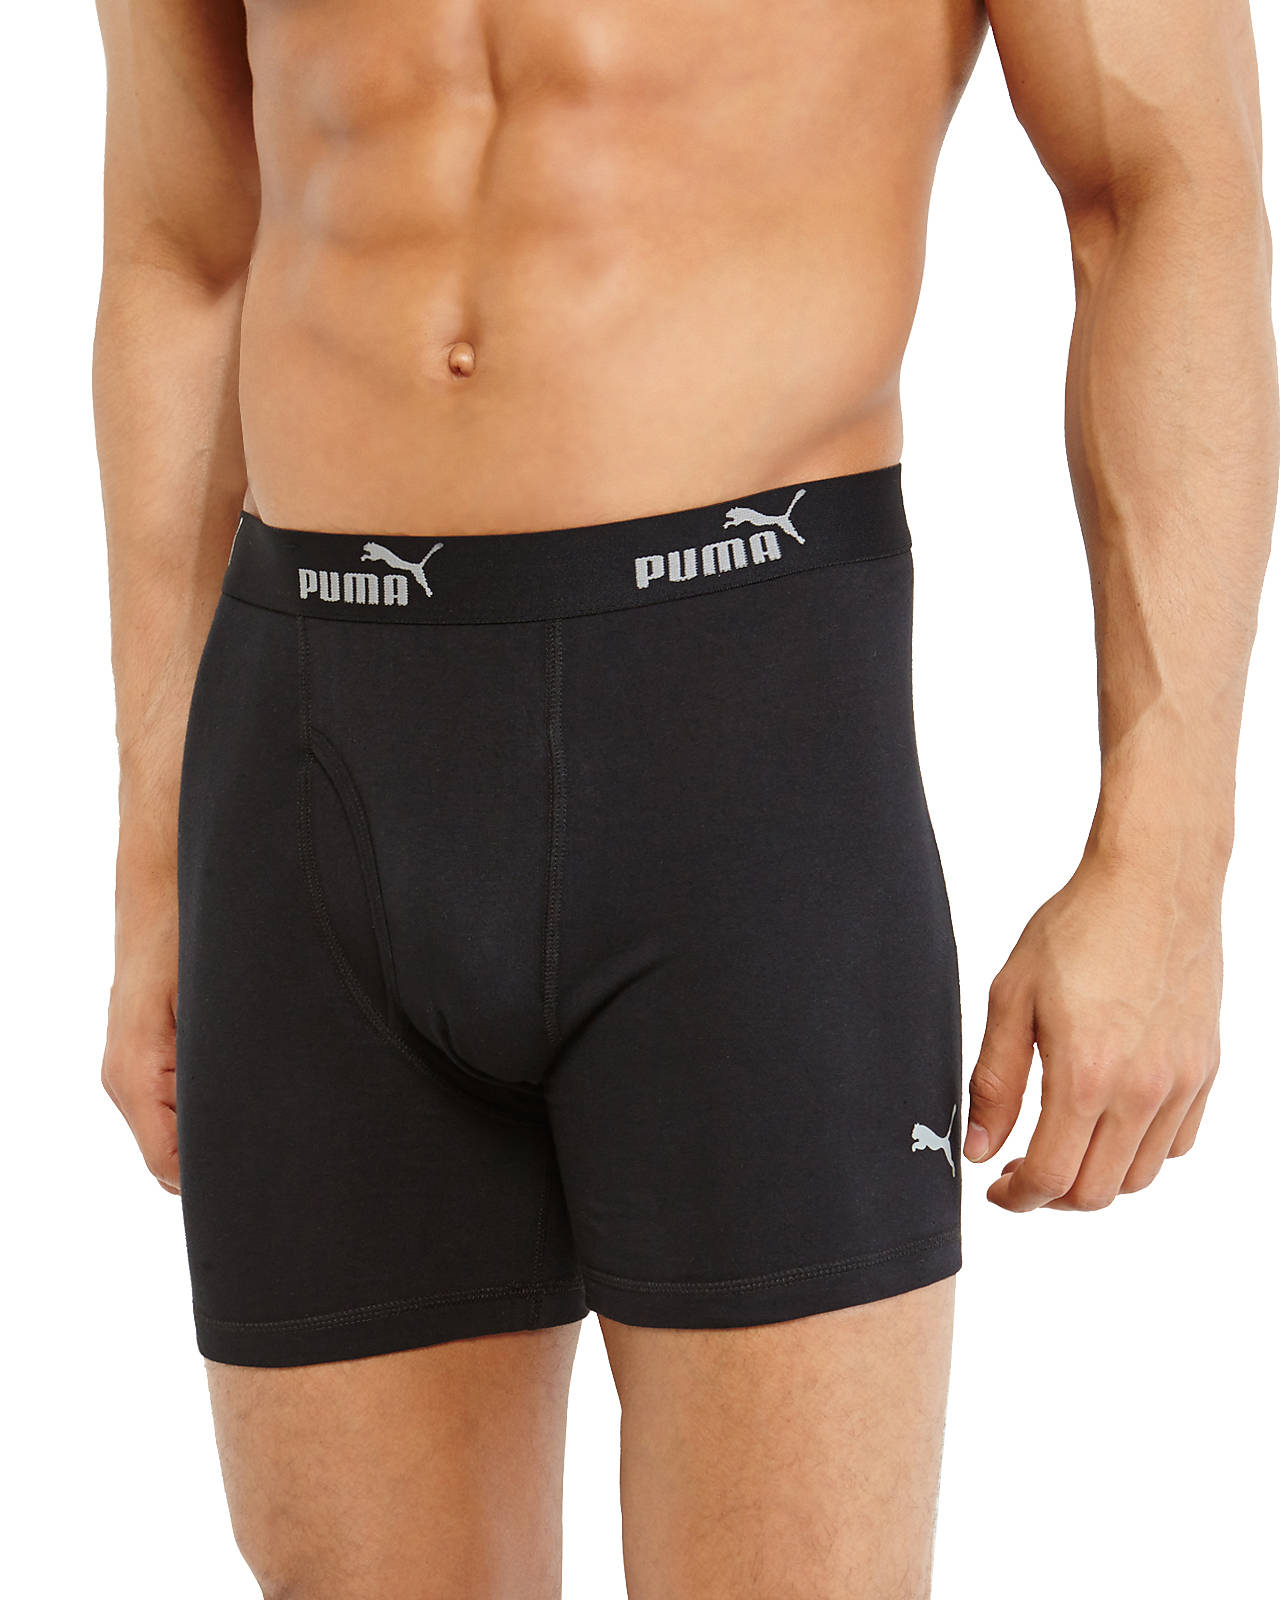 8e939c60e8b1 PUMA 3-Pack Boxer Briefs in Black for Men - Lyst